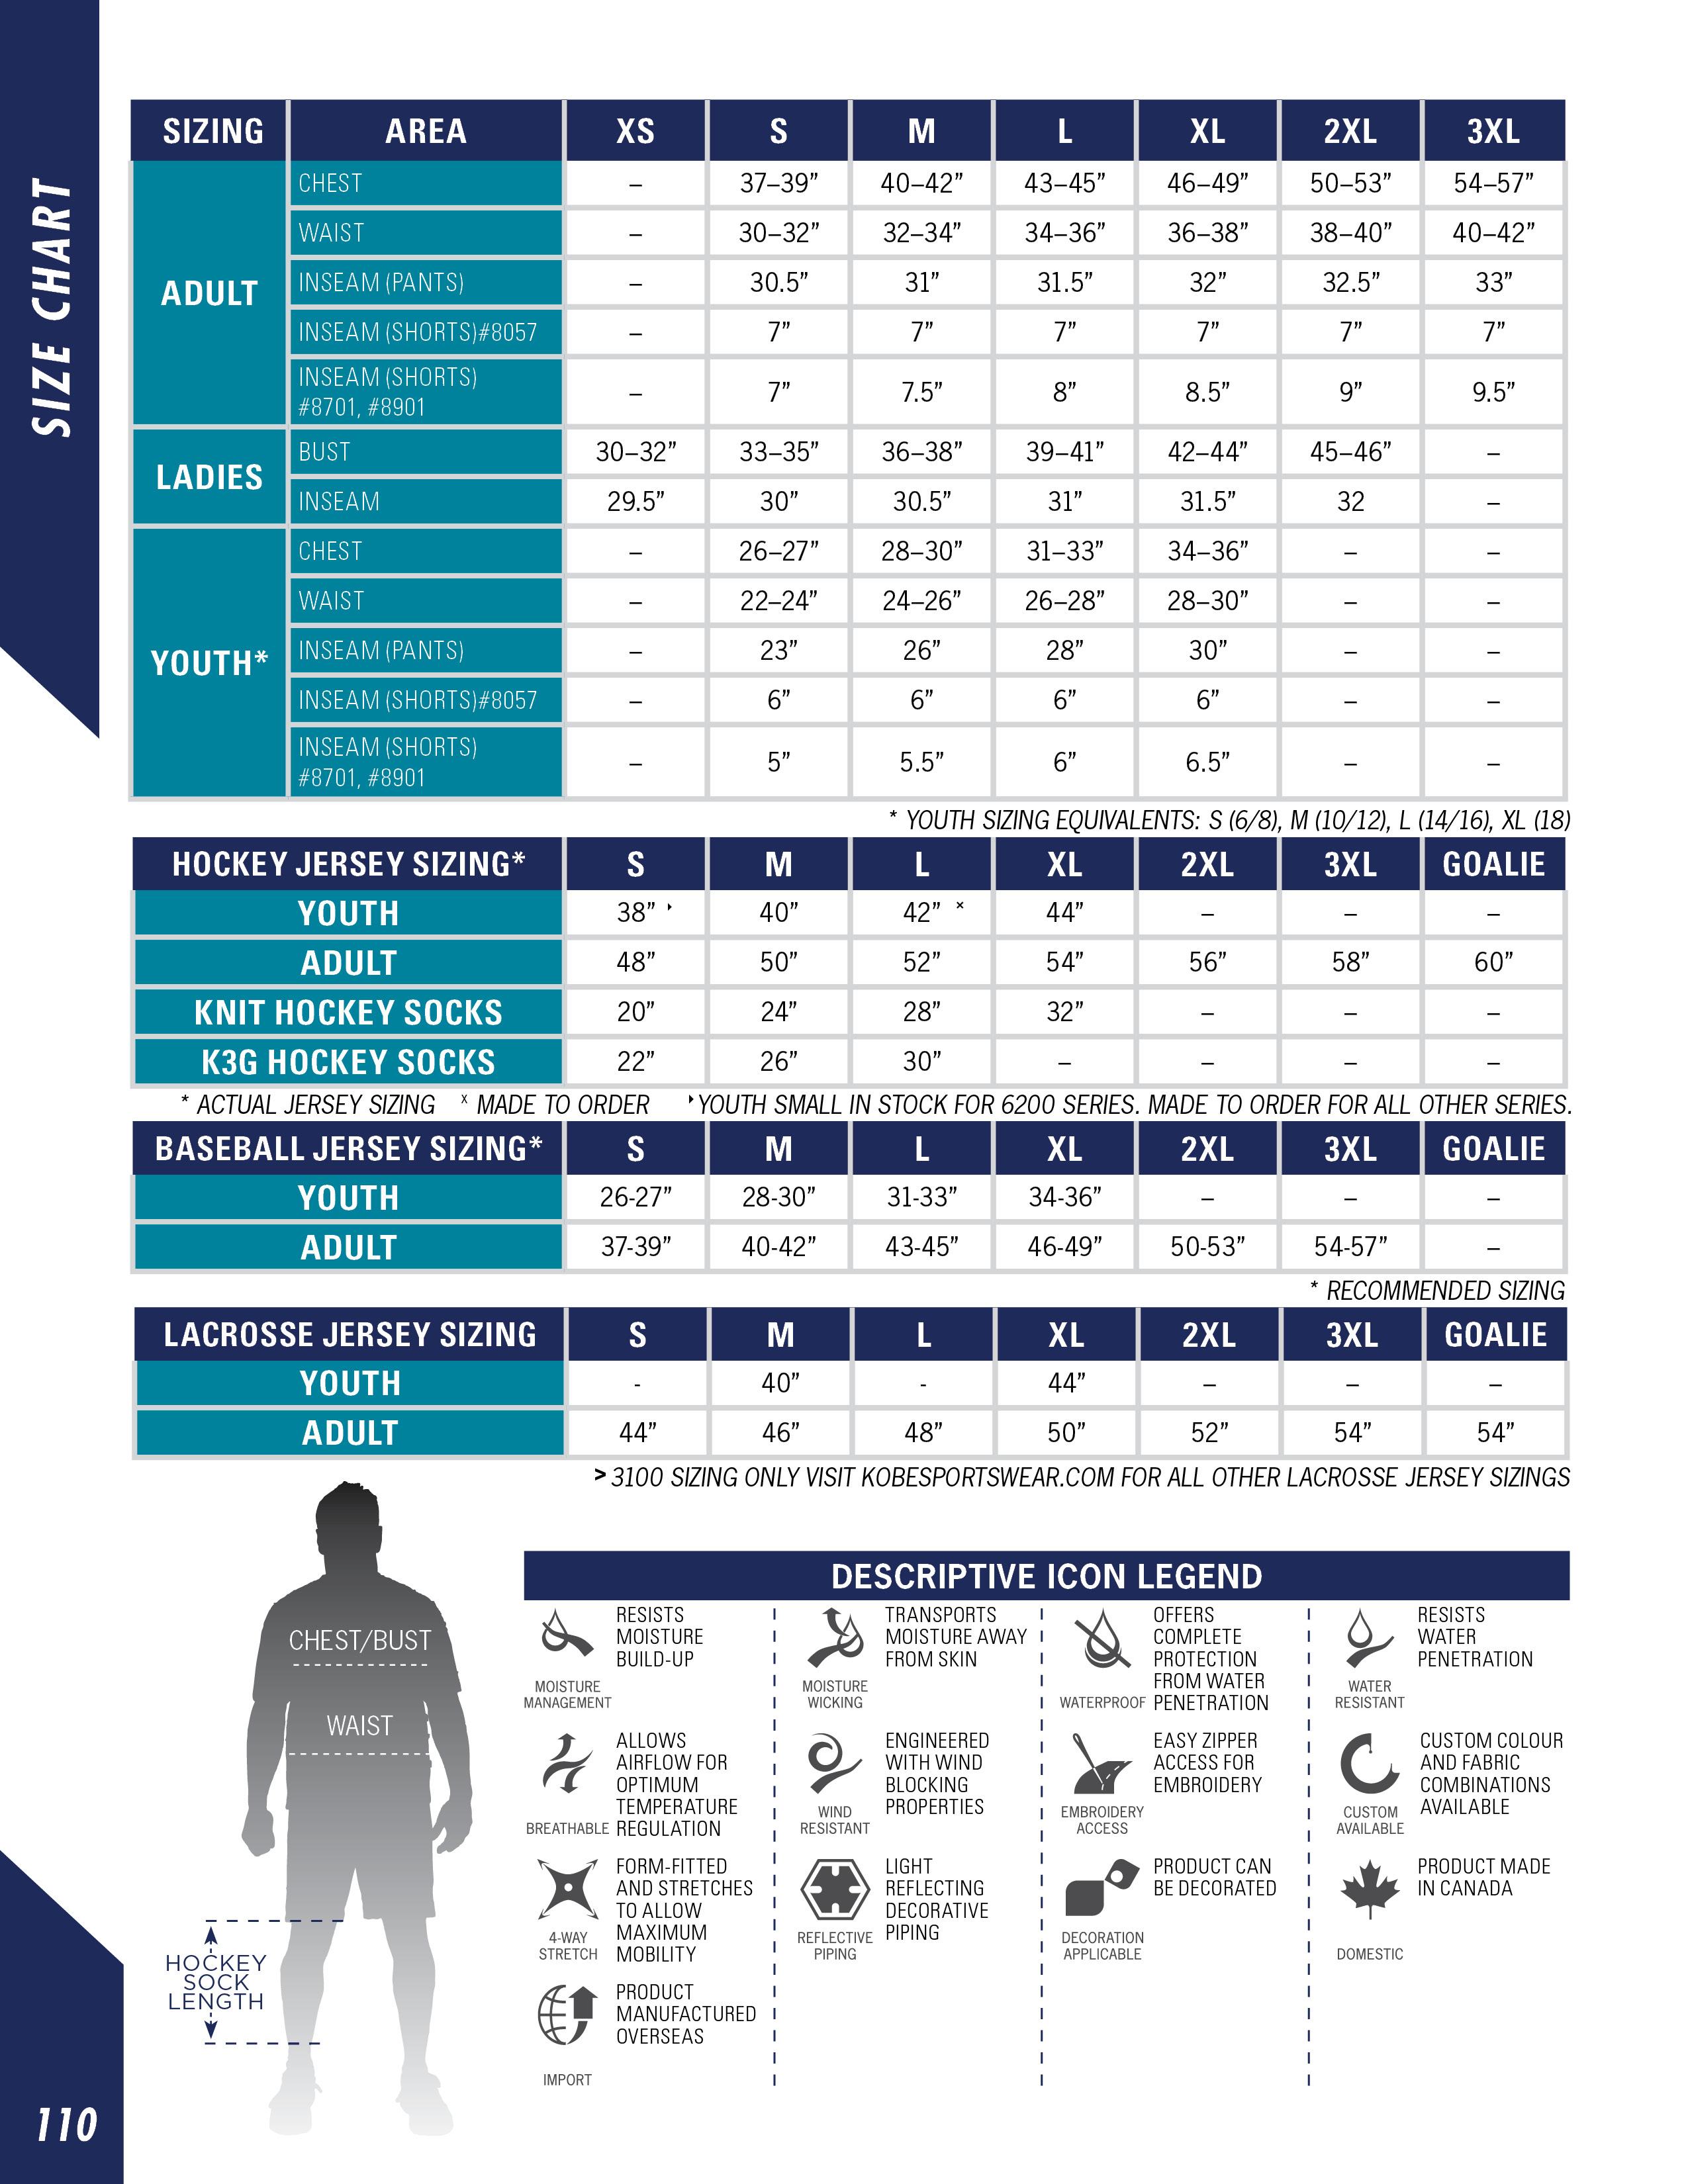 2014kobecatalogue-size-chart.jpg